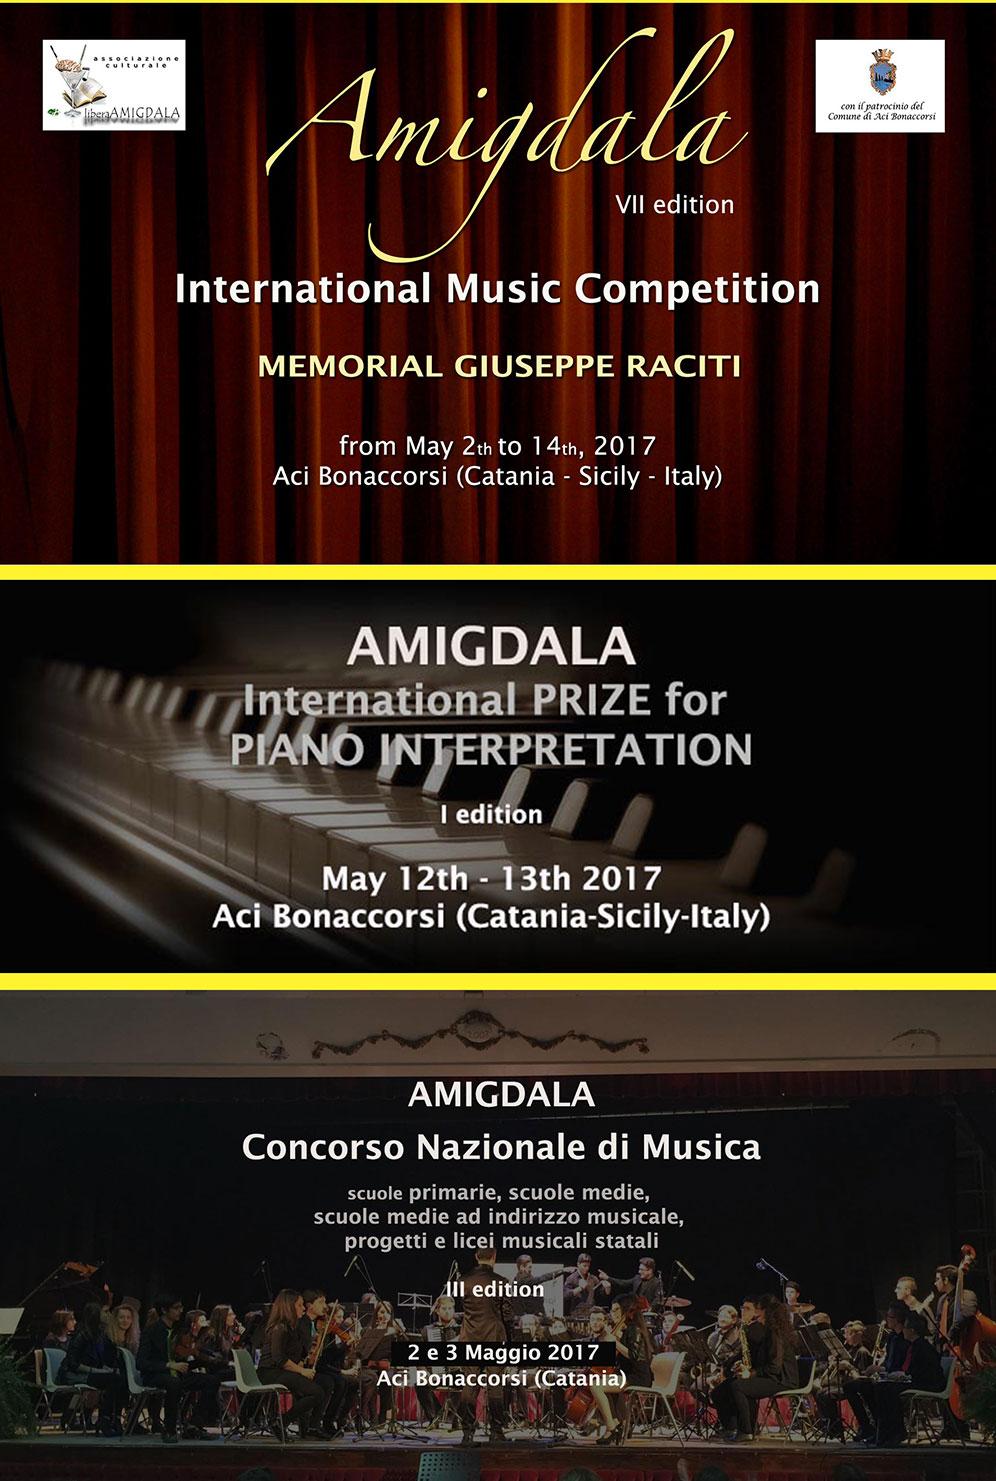 Amigdala - International Music Competition